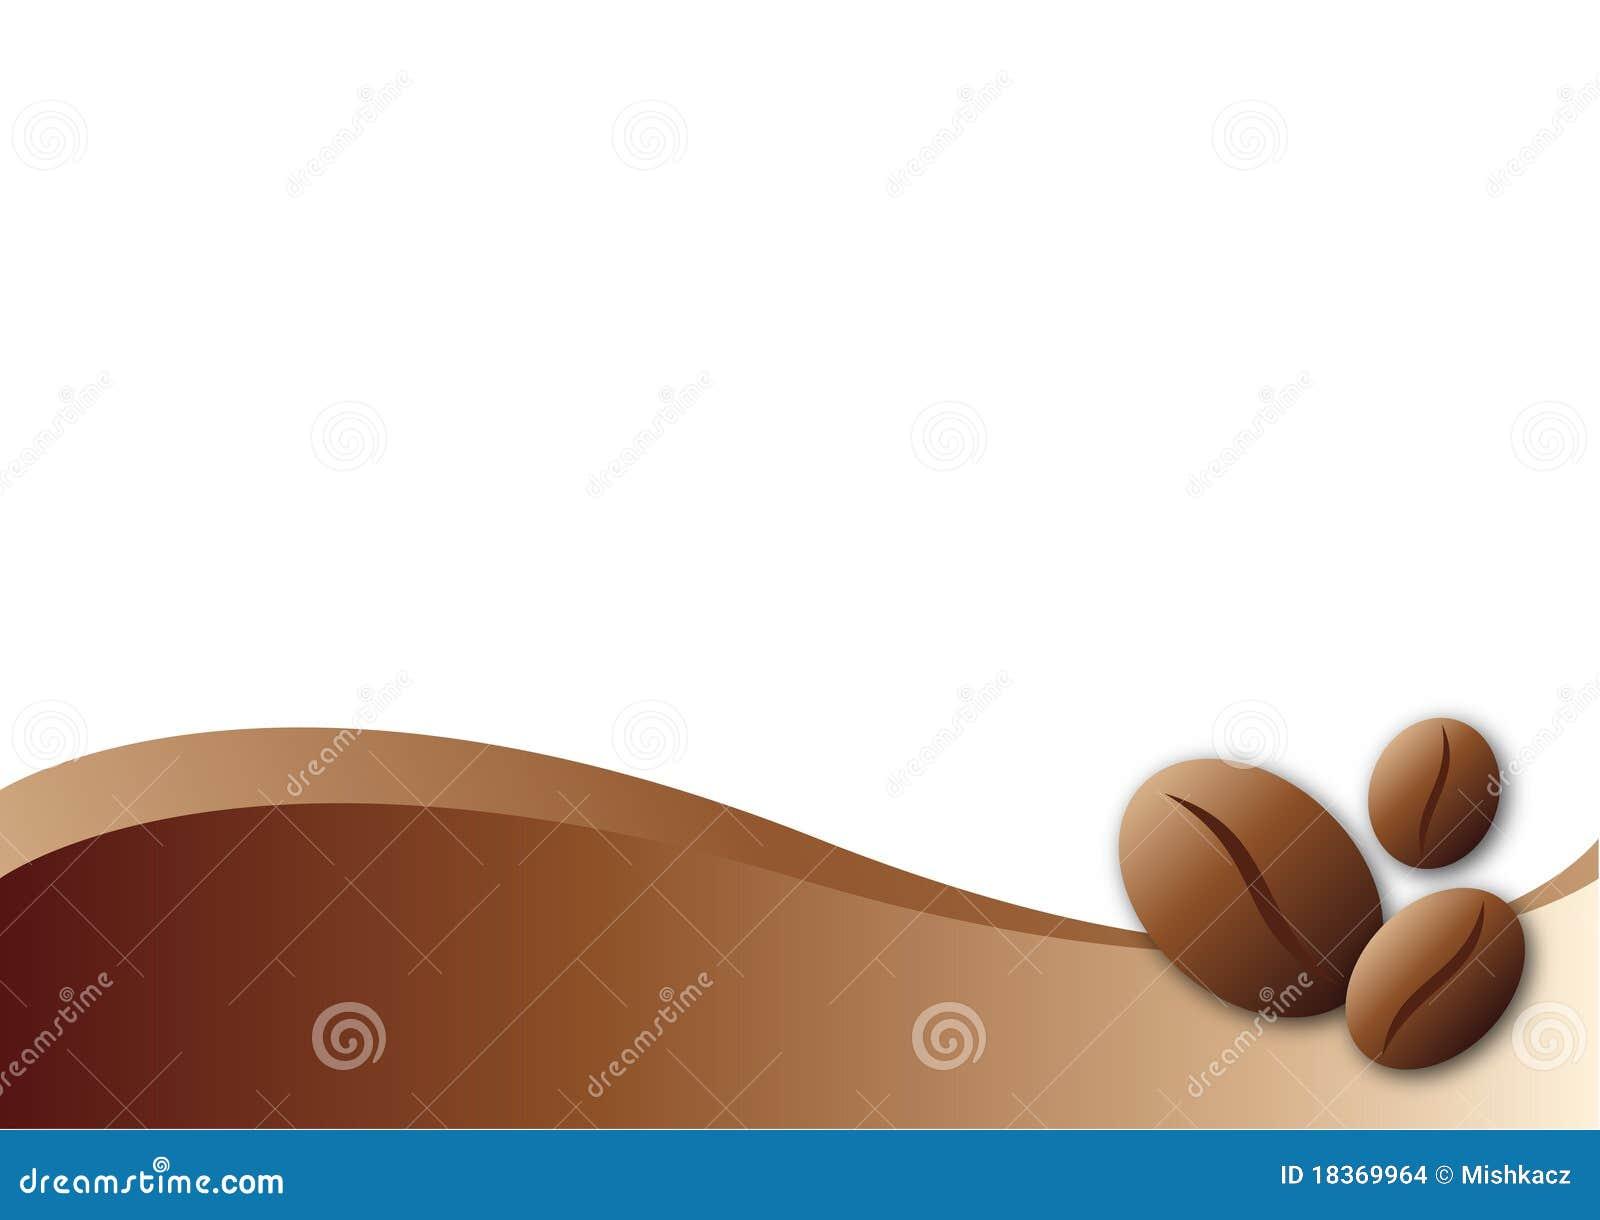 coffee template background stock vector illustration of drink 18369964. Black Bedroom Furniture Sets. Home Design Ideas